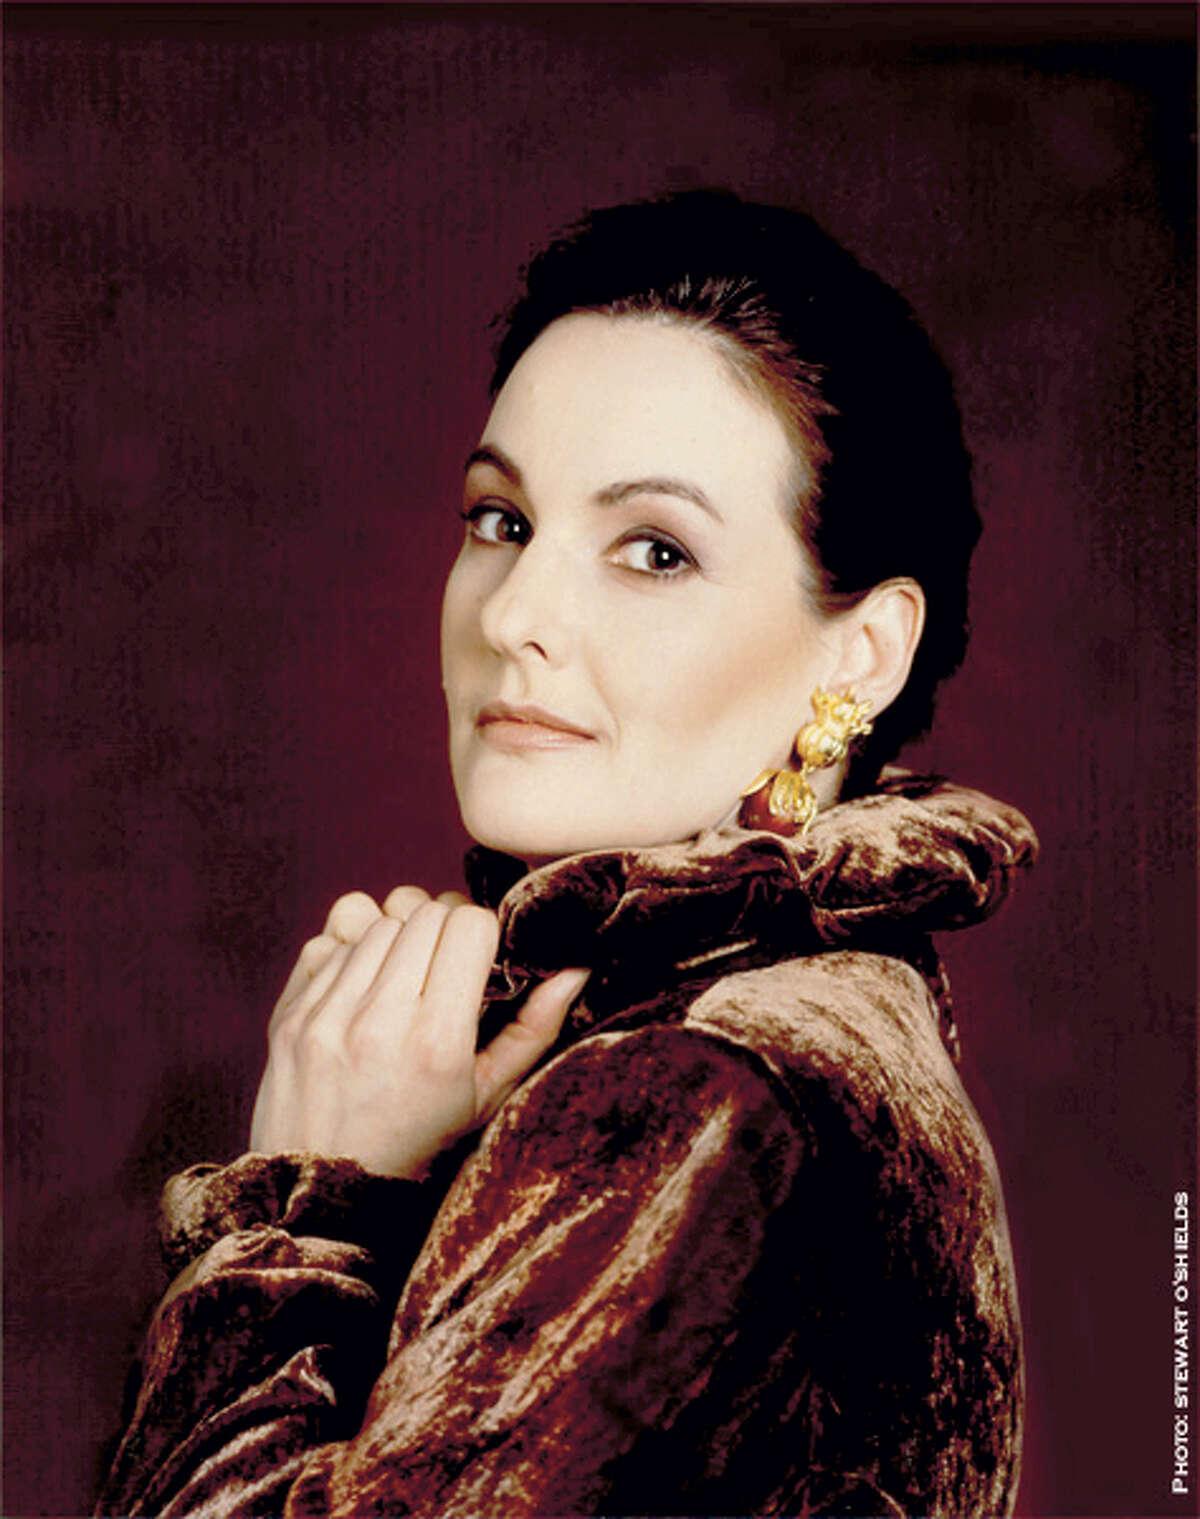 Met Opera veteran Susanne Mentzer will host and perform.